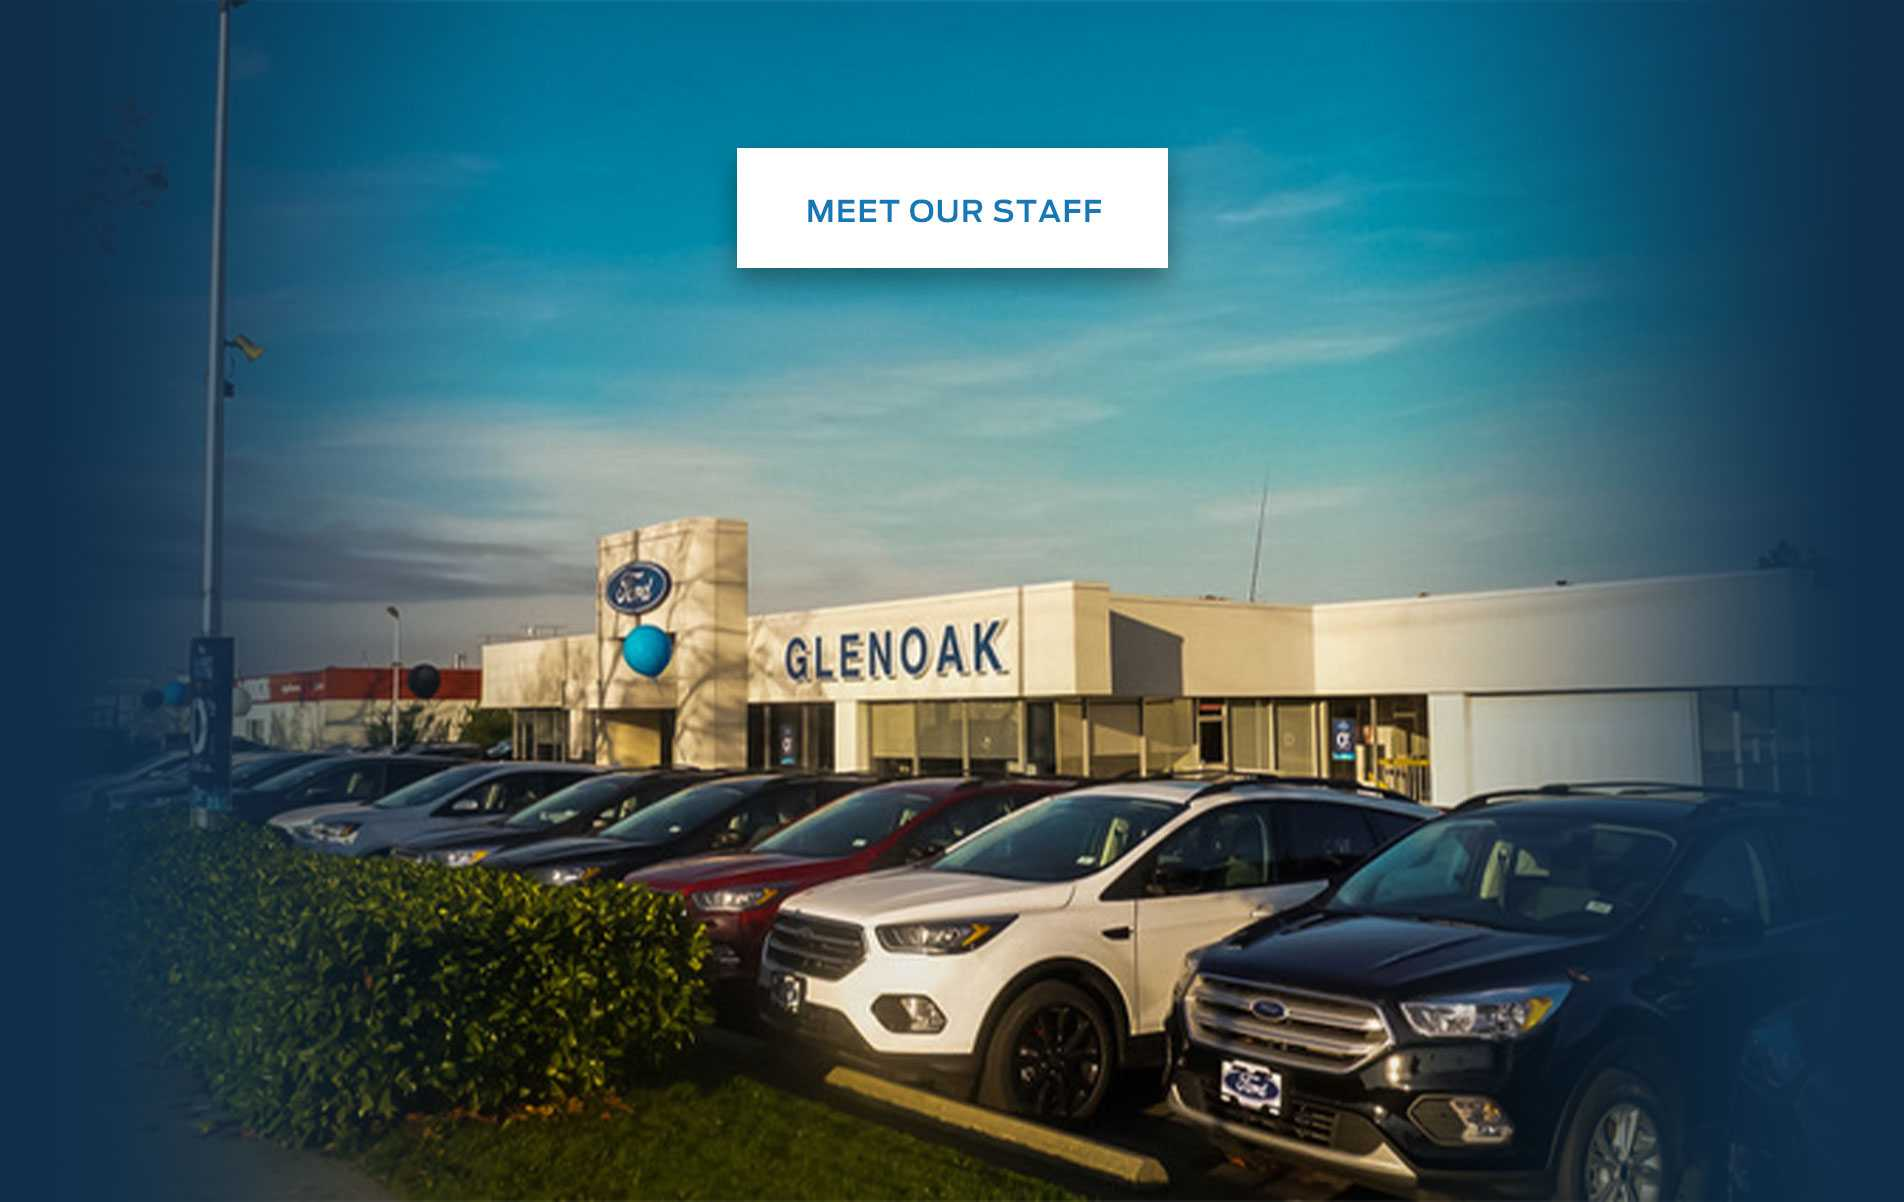 Meet Our Staff Glenoak